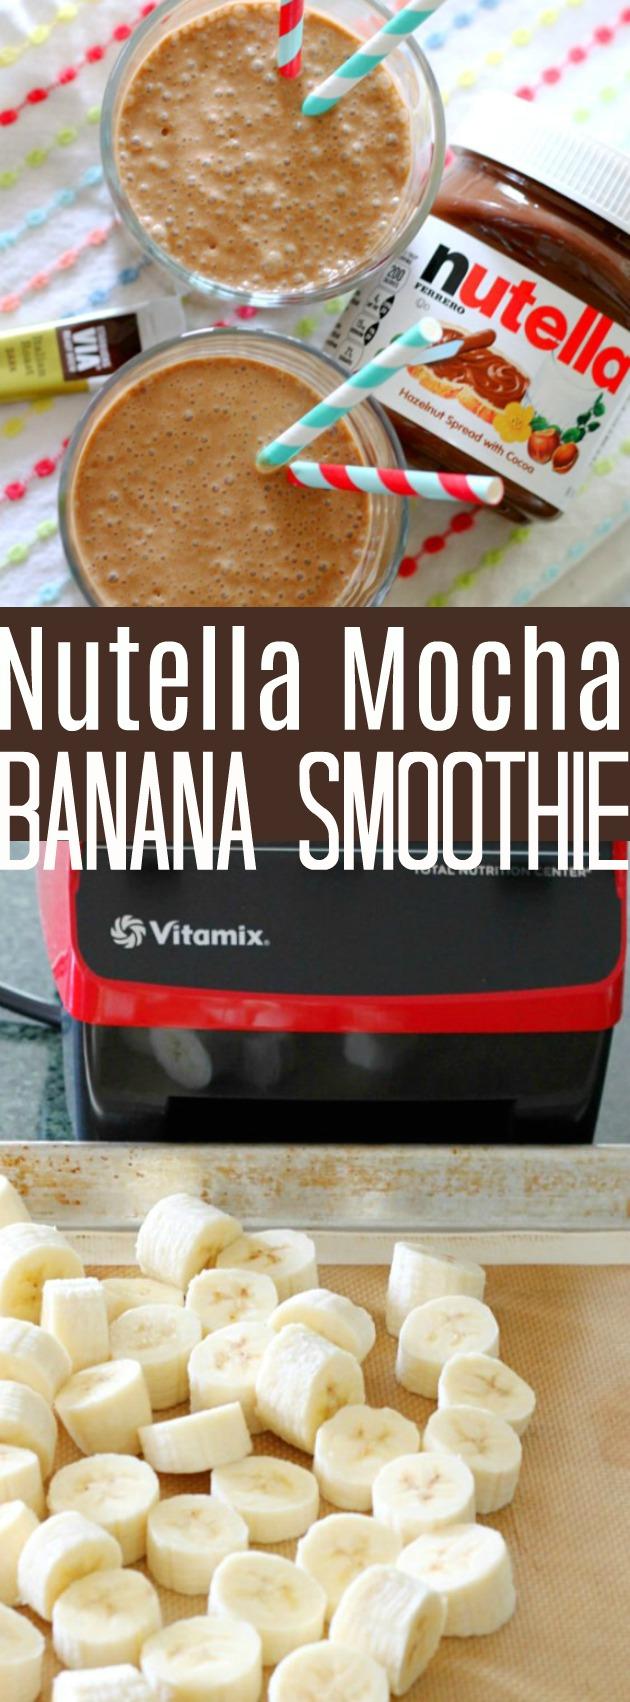 Nutella Mocha Banana Smoothie